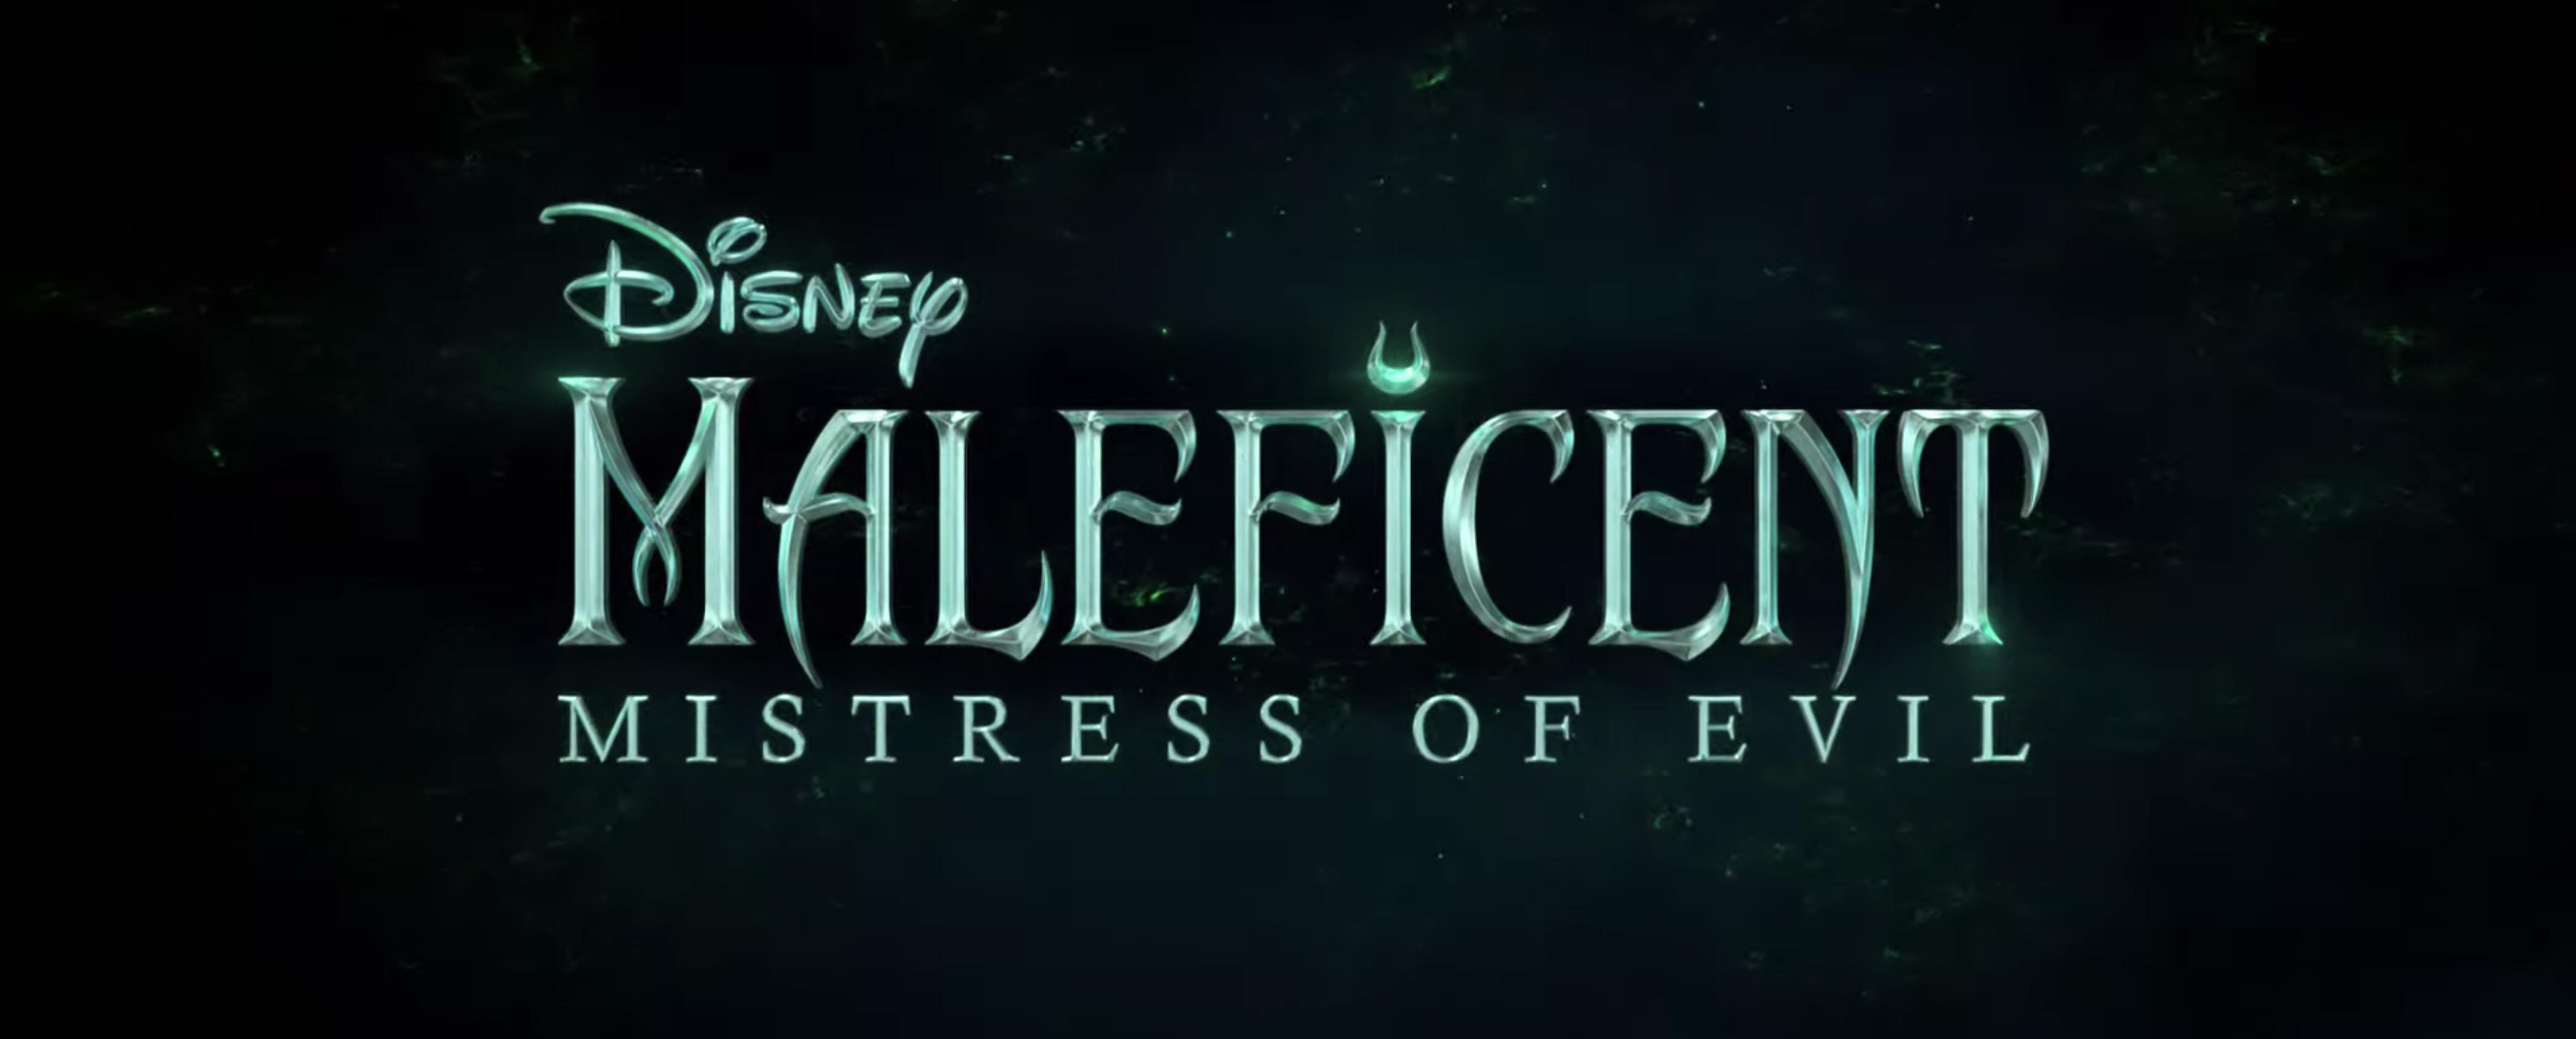 Disney Releases Mulan Trailer New Photos Of Joaquin